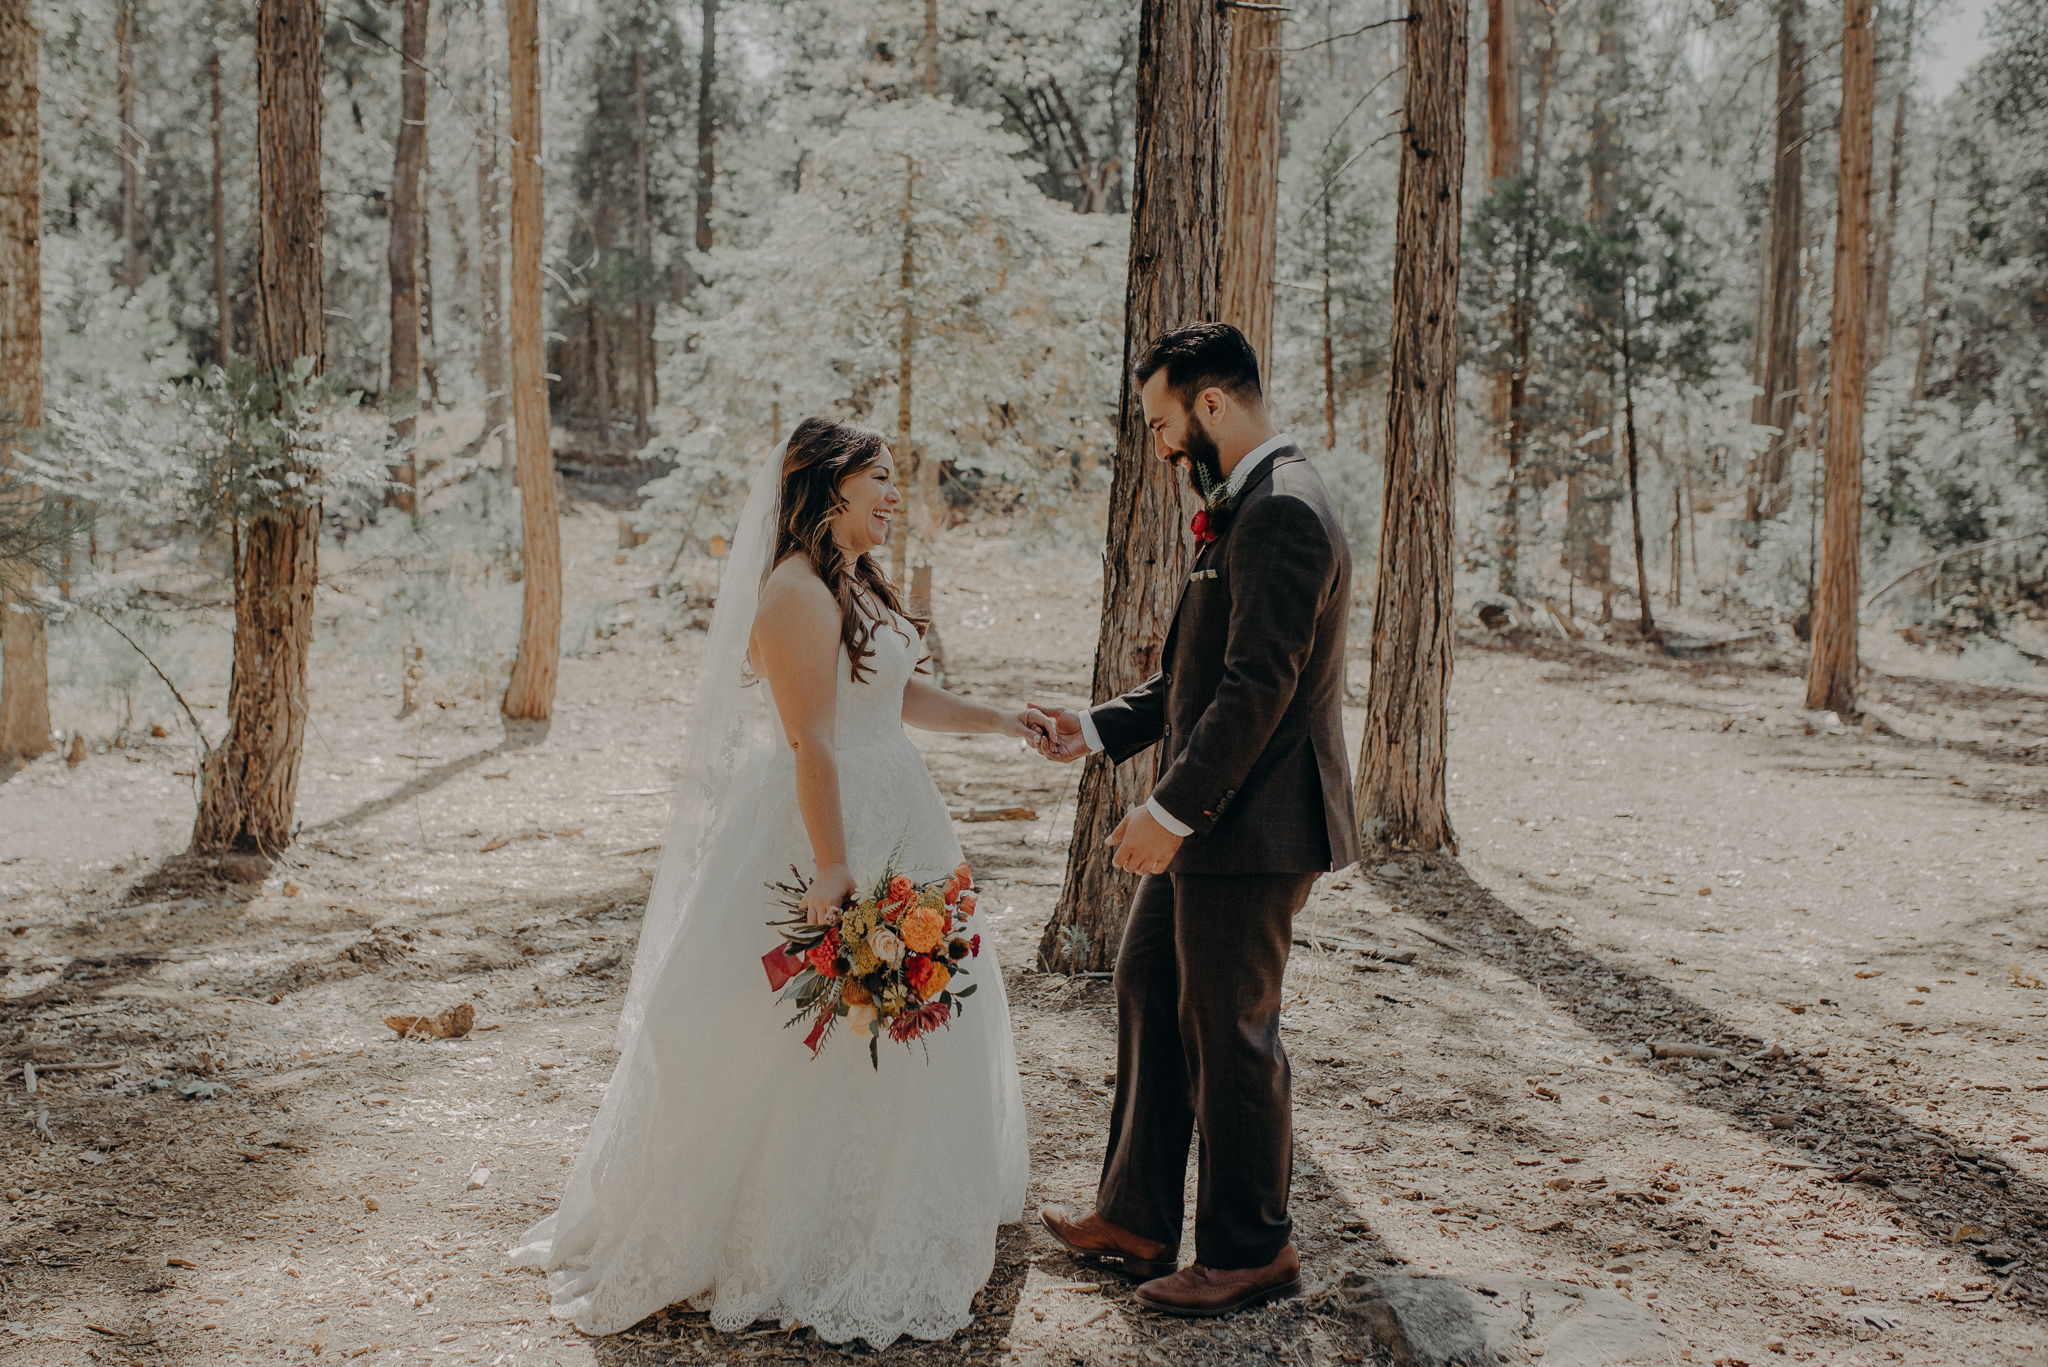 Yosemite Elopement Photographer - Evergreen Lodge Wedding Photographer - IsaiahAndTaylor.com-072.jpg